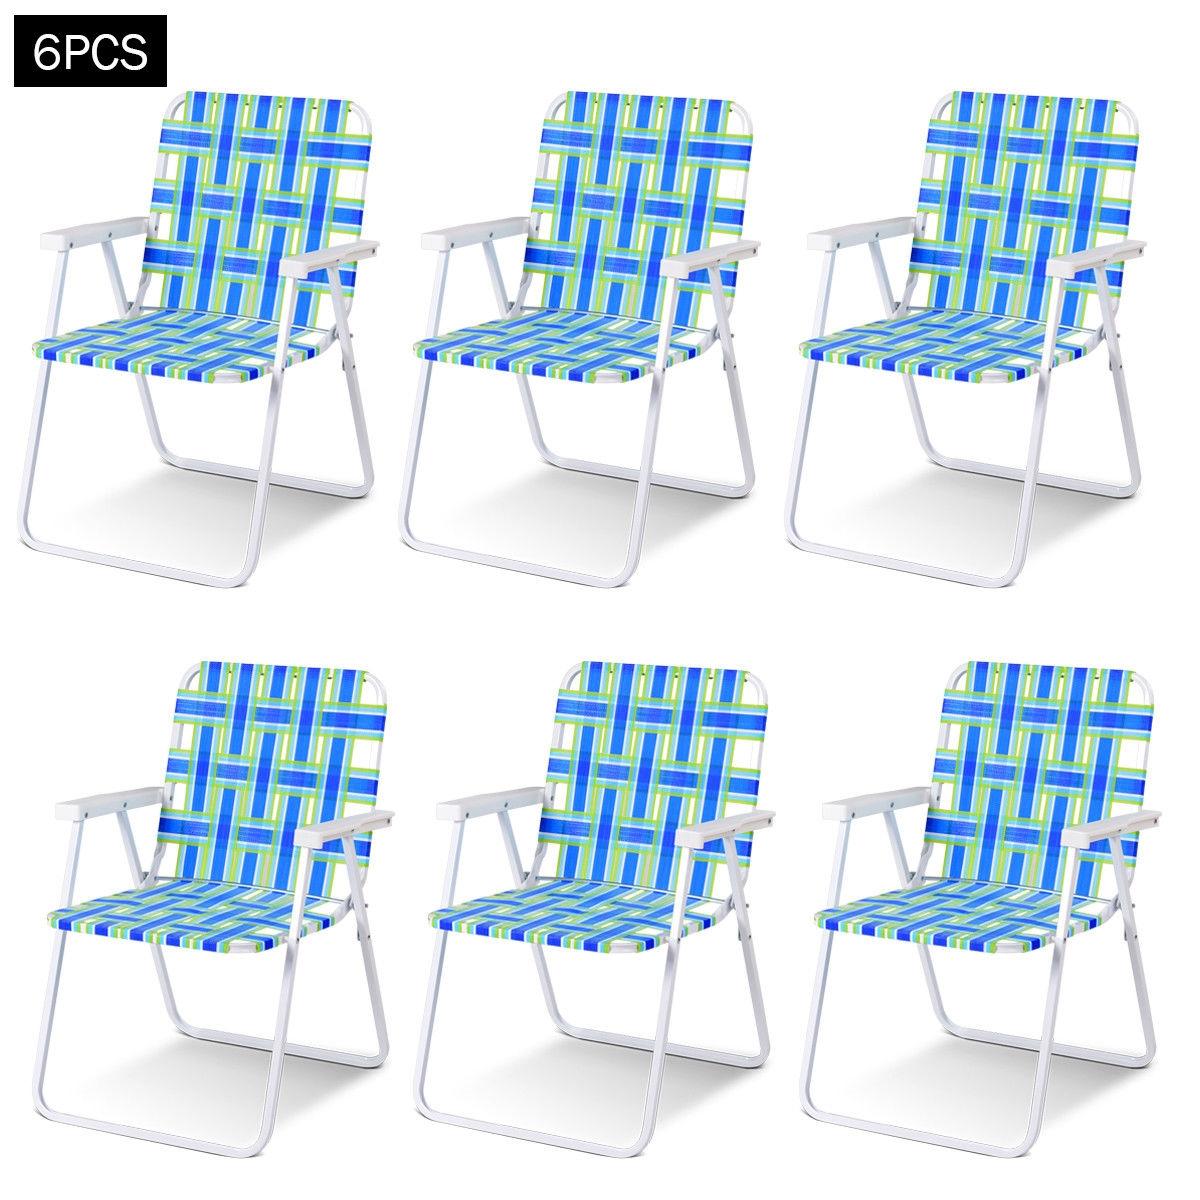 6 pcs Folding Beach Chair Camping Lawn Webbing Chair-Blue